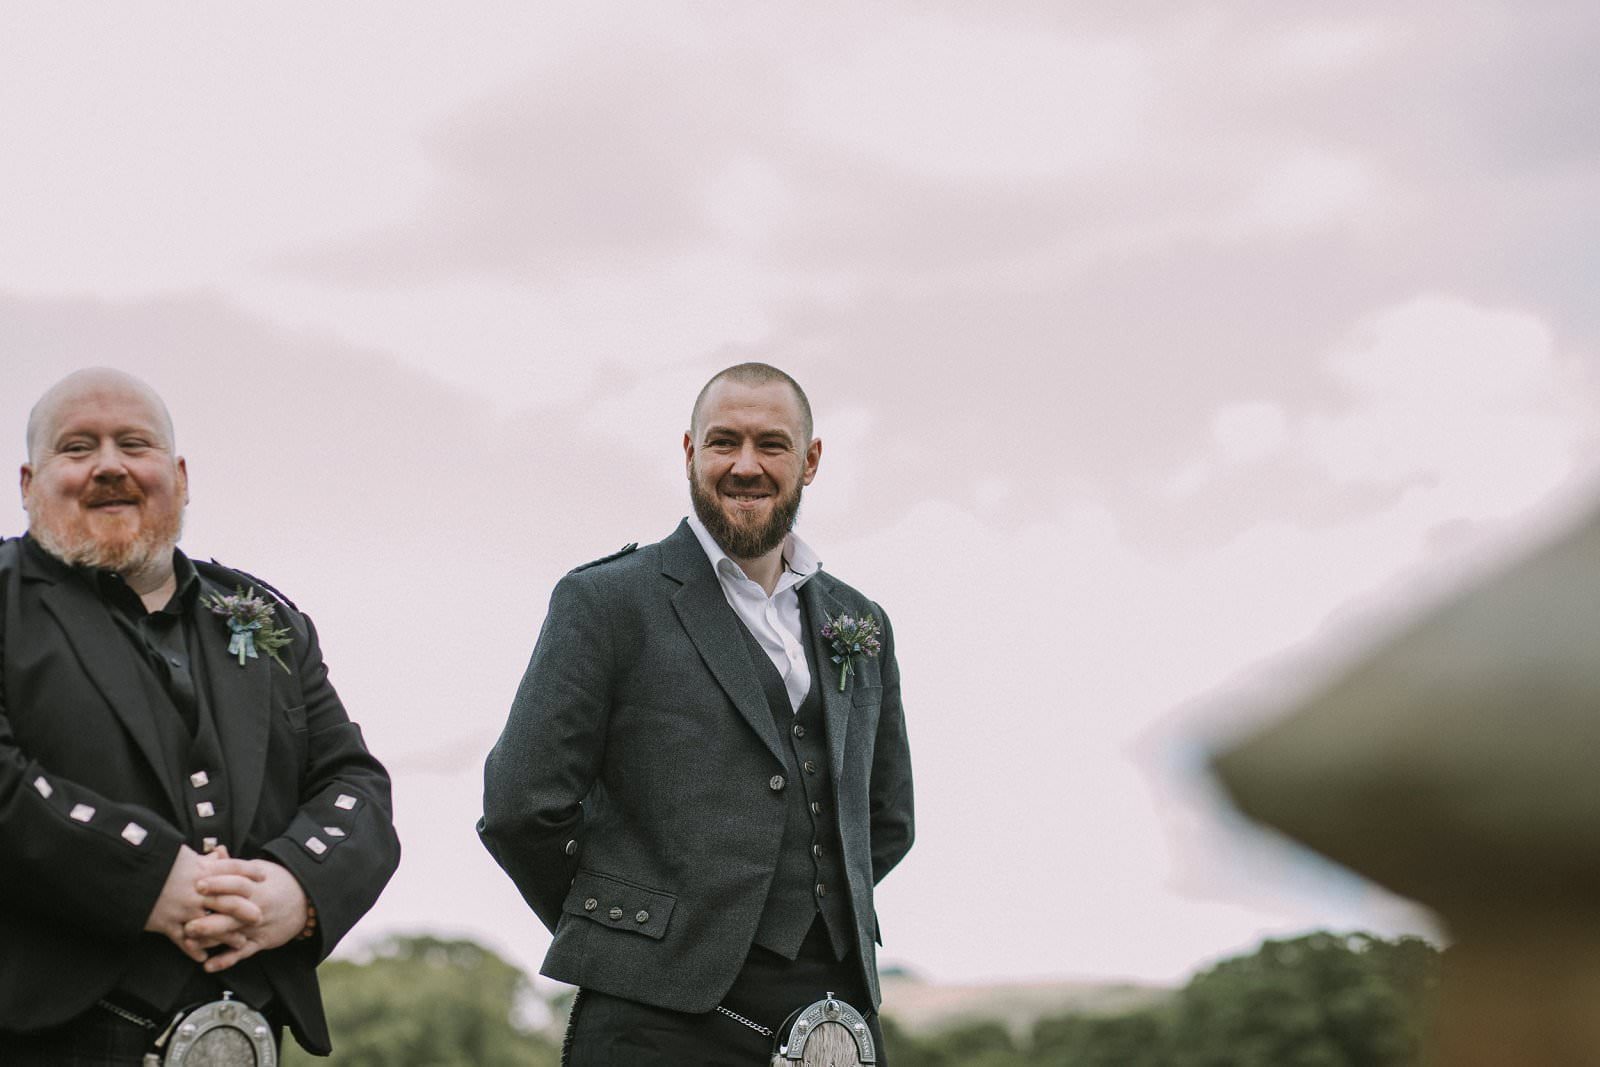 abbotsford-house-wedding-photographer-25